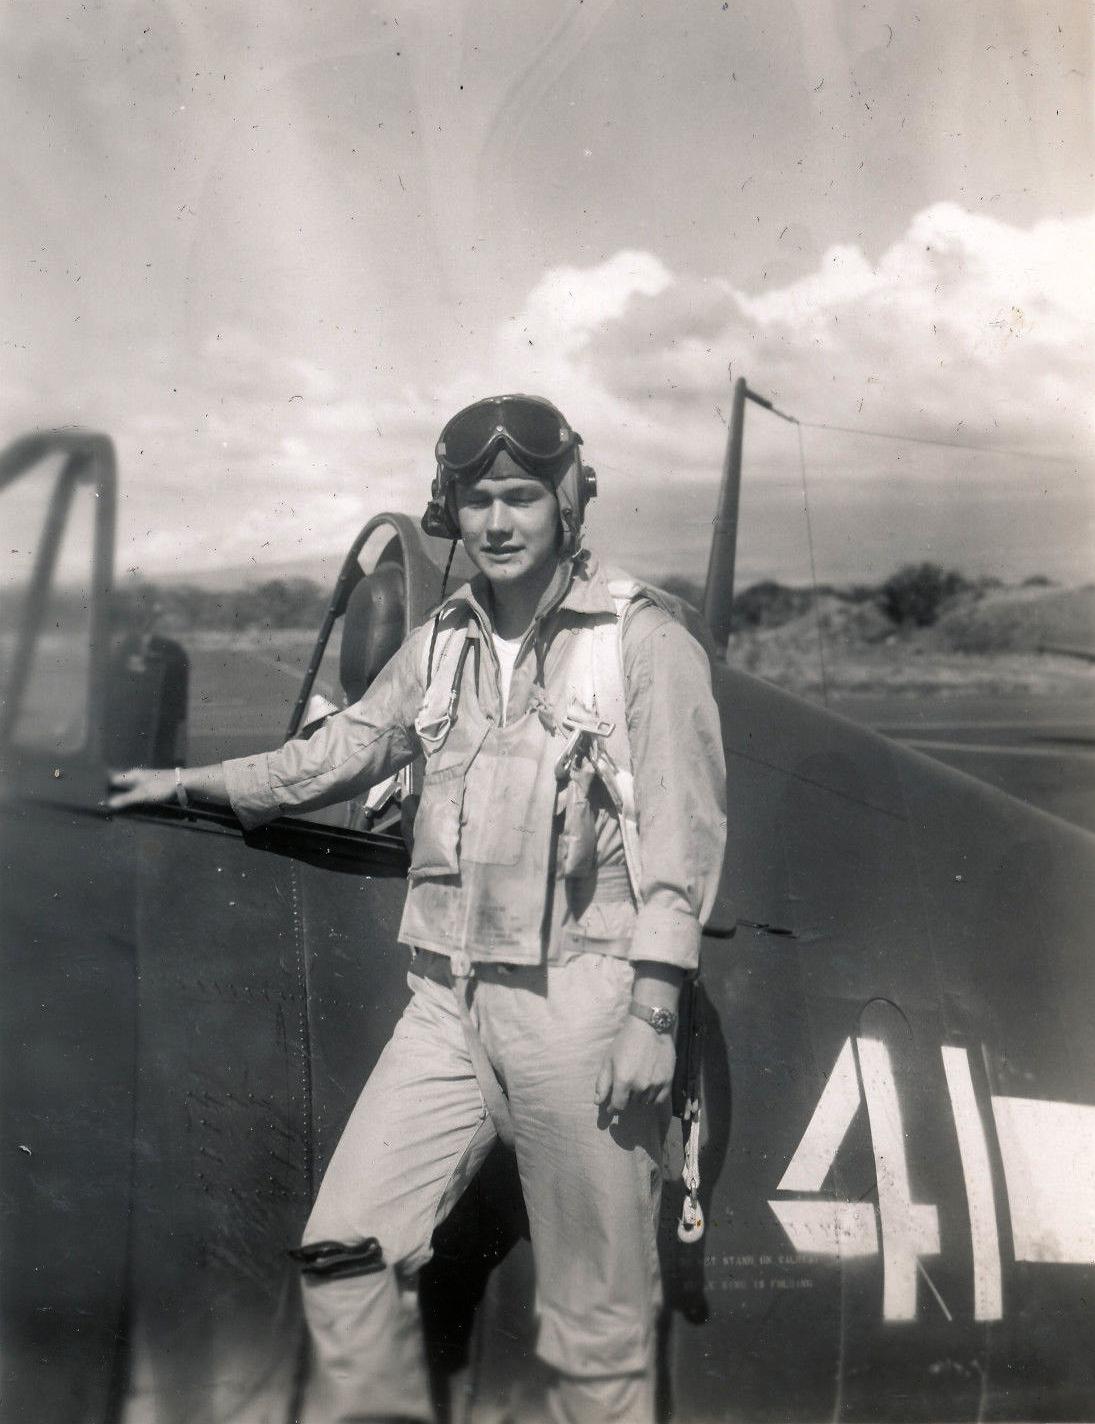 Aircrew USN VBF 8 Ens Blank NAS Puunene 1945 01